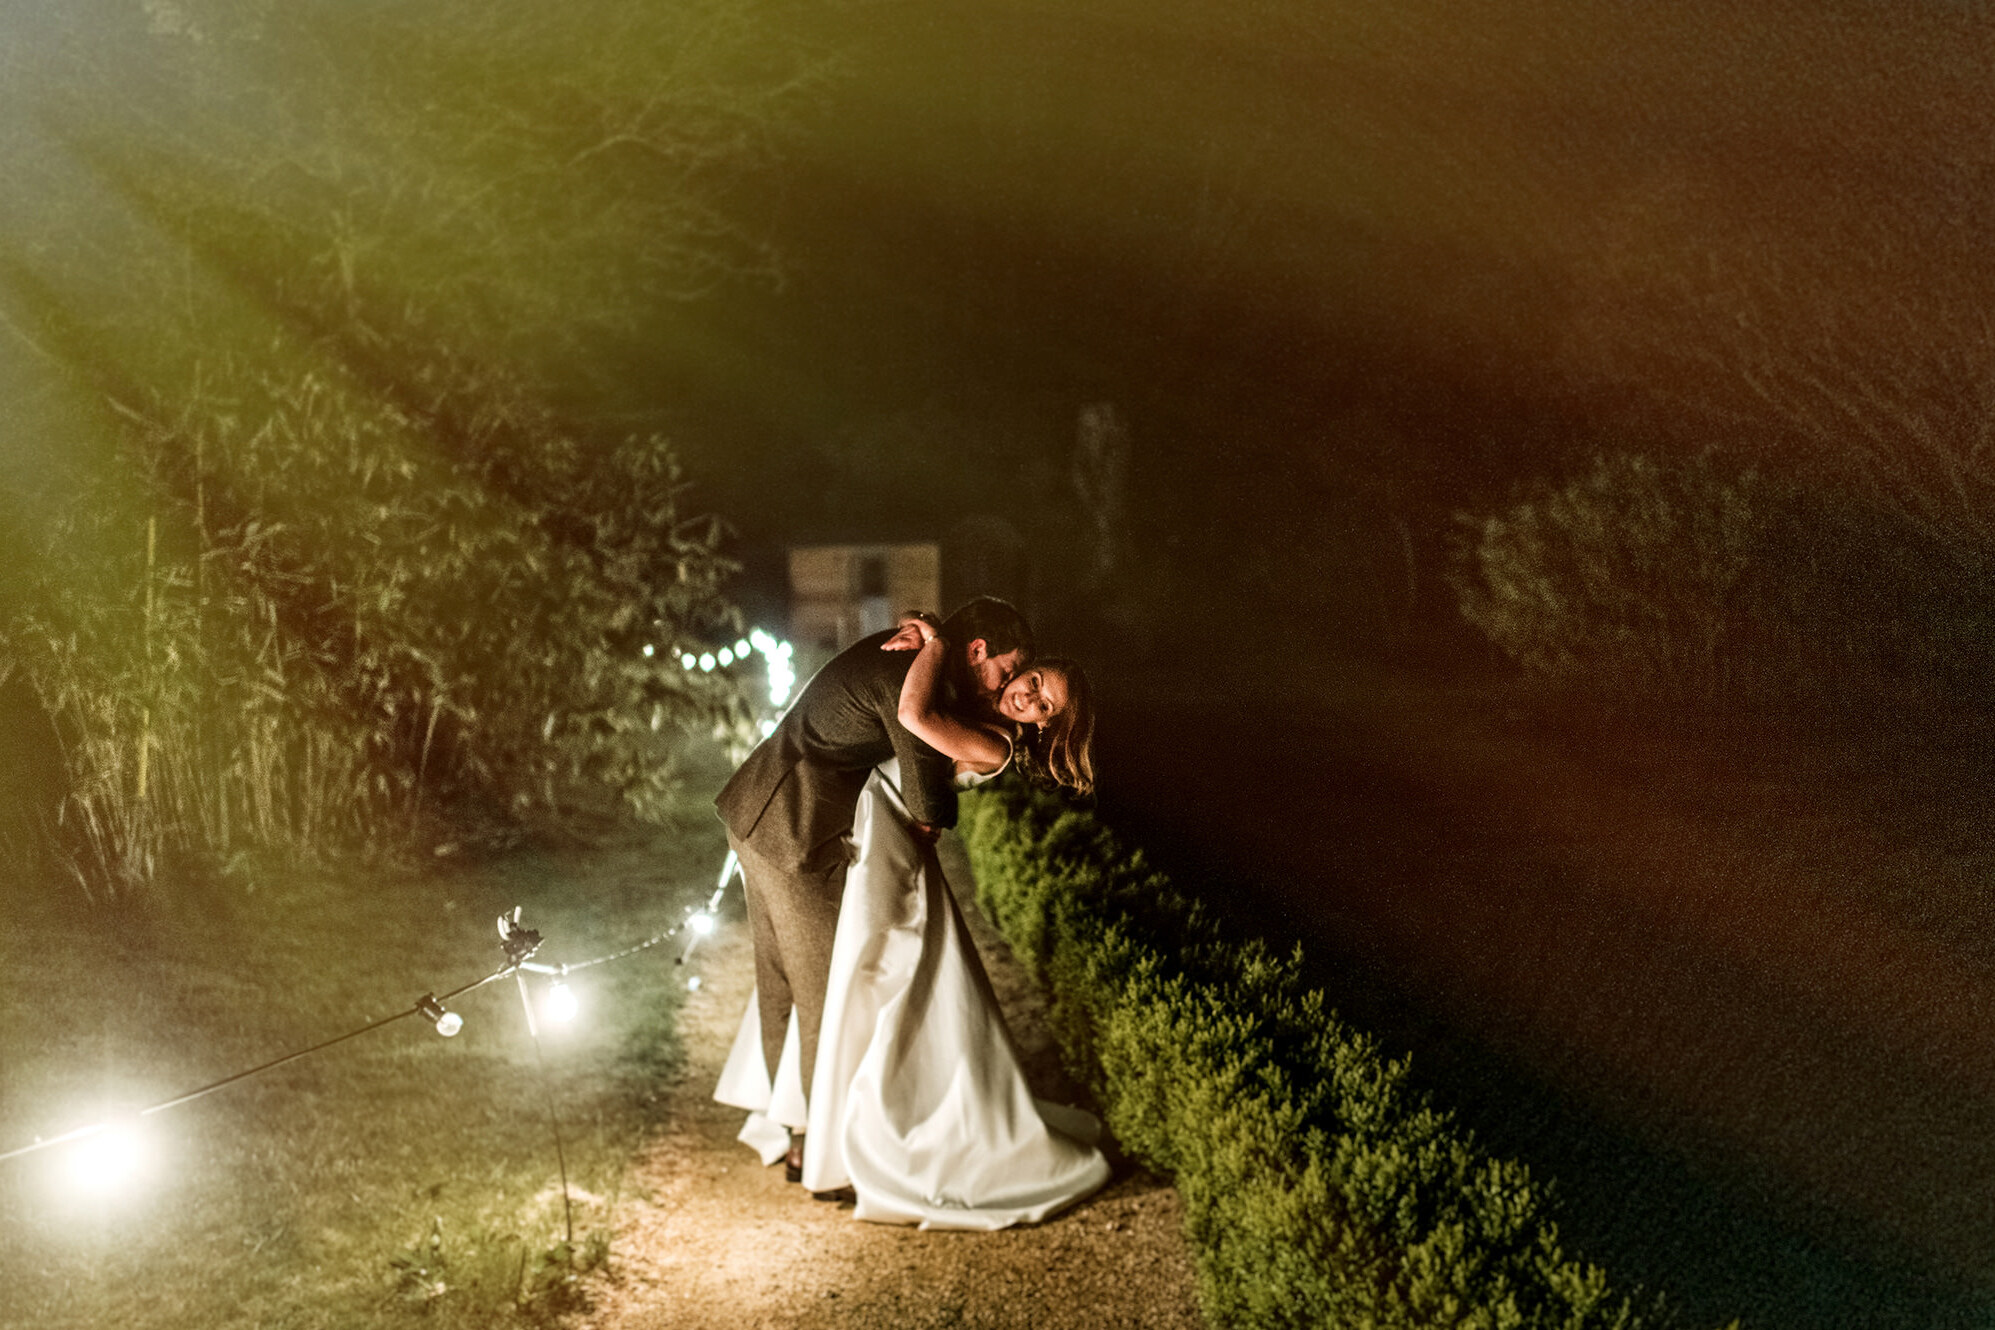 horetown house wedding, darek novak, wedding couples,kiss,night shot of couples,wedding venue